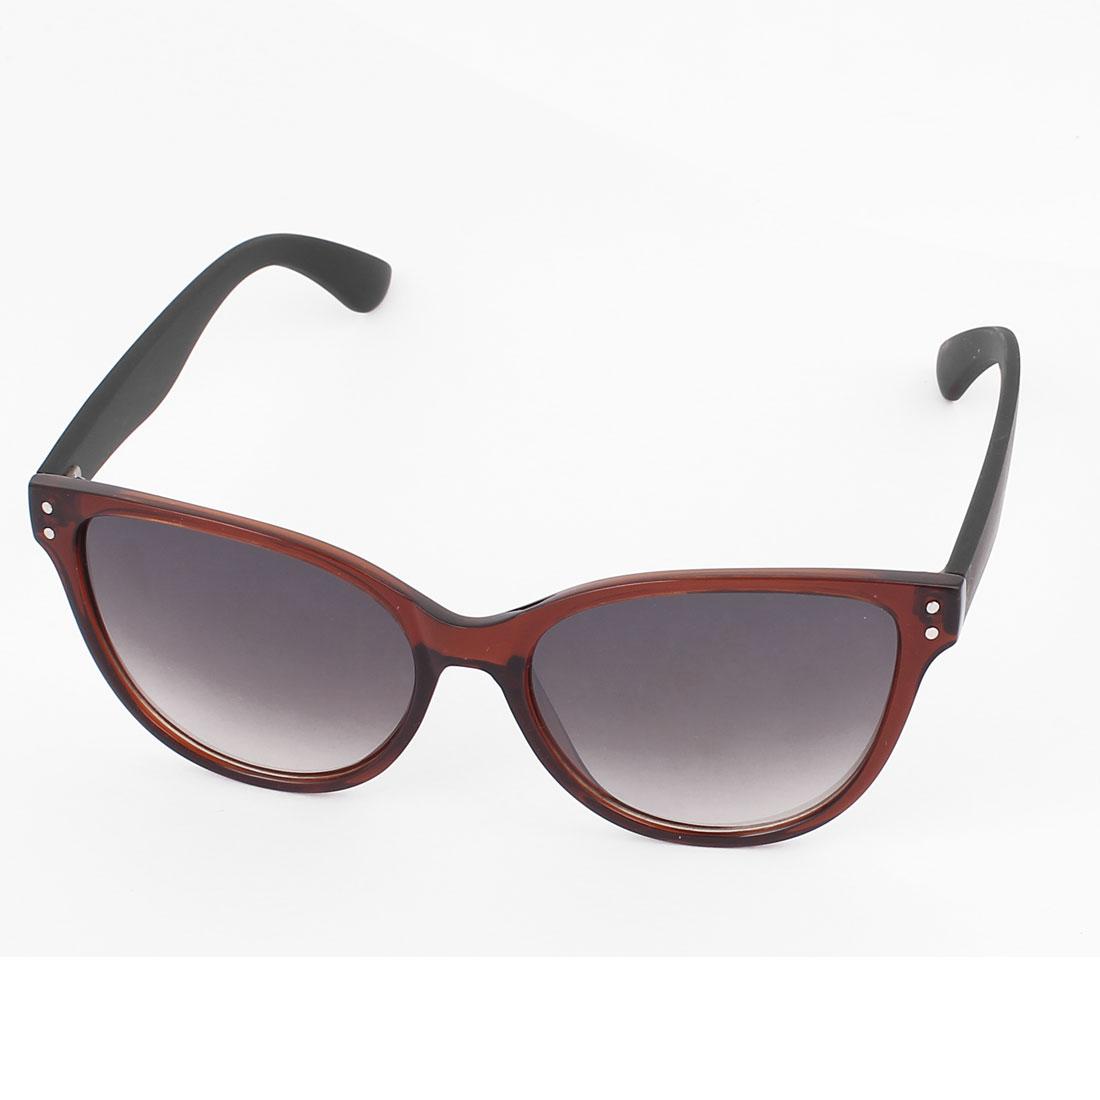 Unisex Plastic Full Frame Gradient Lens Single Bridge Sunglasses Eyeswear Glasses Eyes Protector Brown